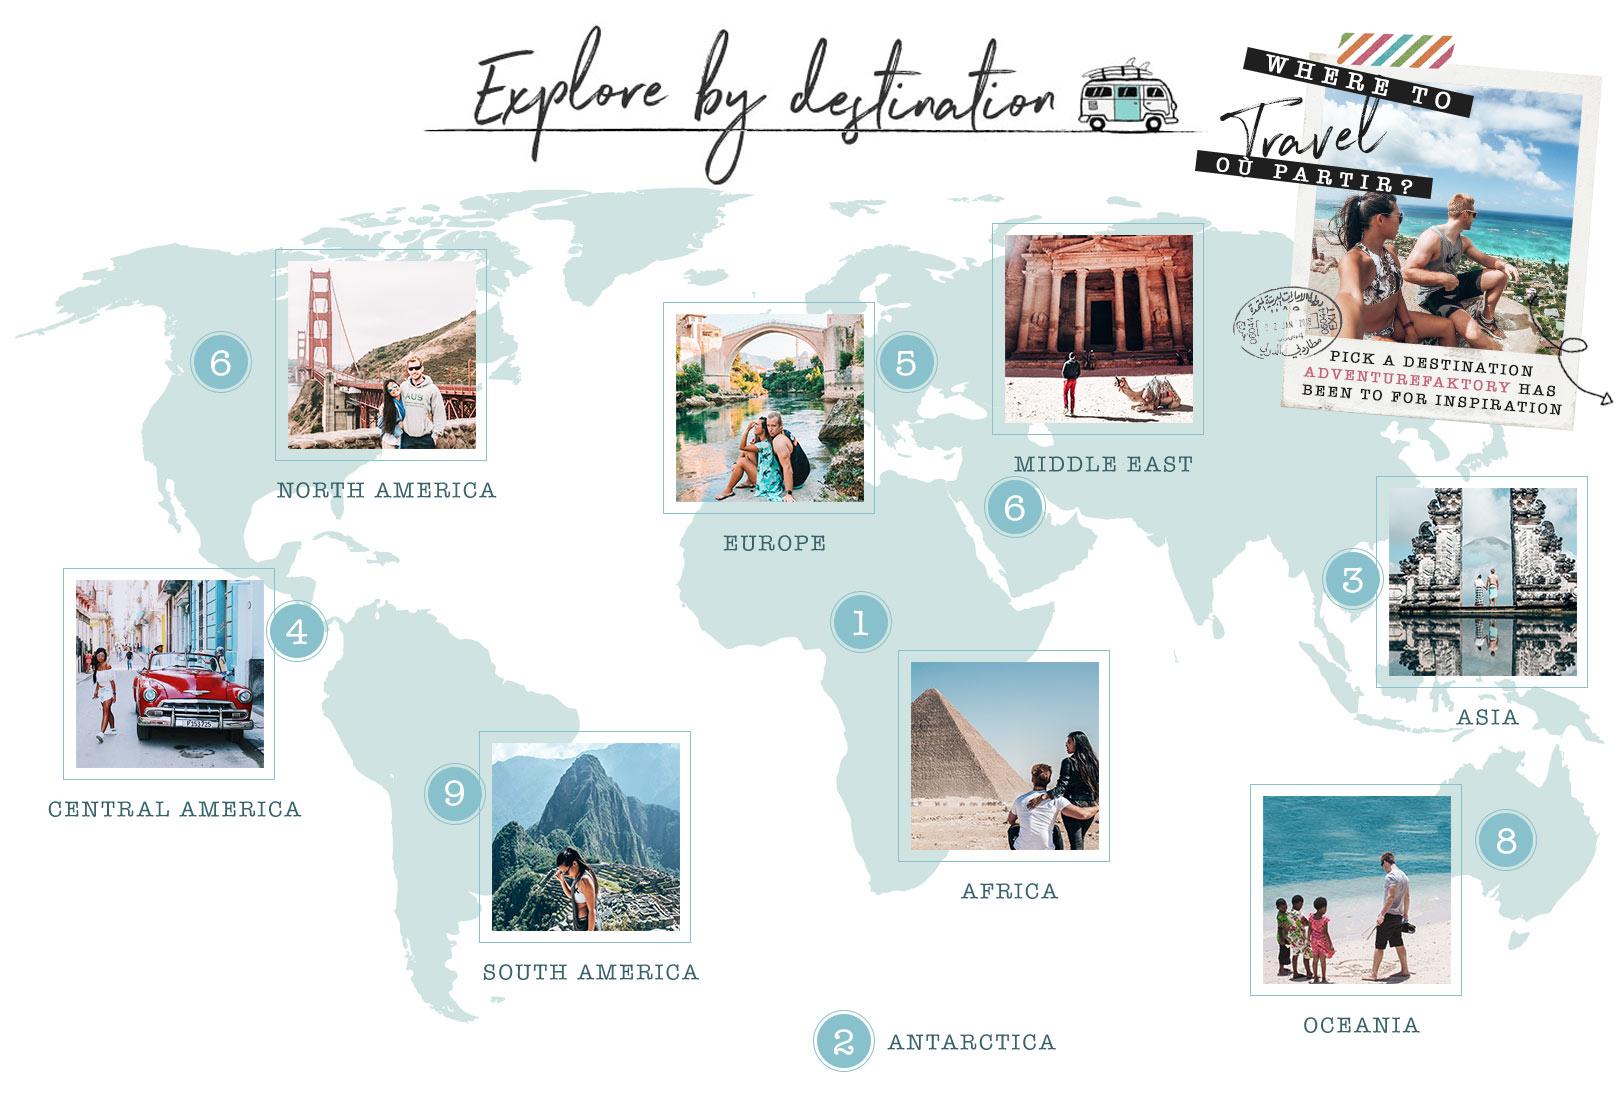 AdventureFaktory - Dubai Travel Magazine